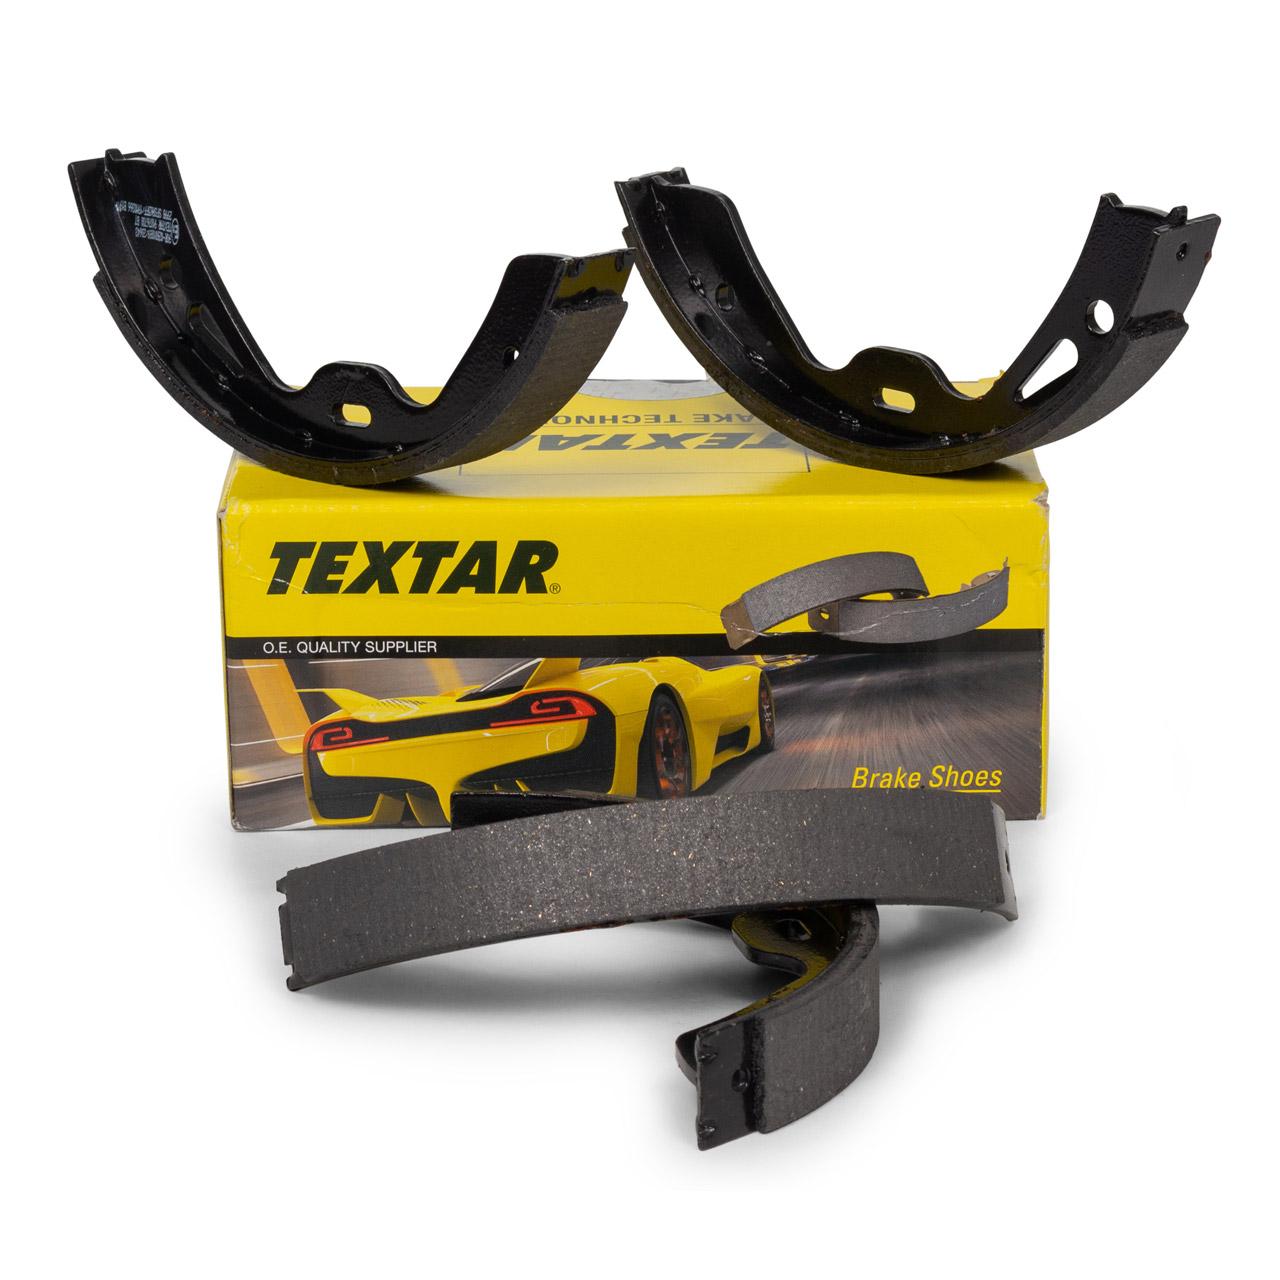 TEXTAR 91076700 Bremsbacken Satz PORSCHE 991 718 Boxster Cayman 981 982 Panamera 970 971